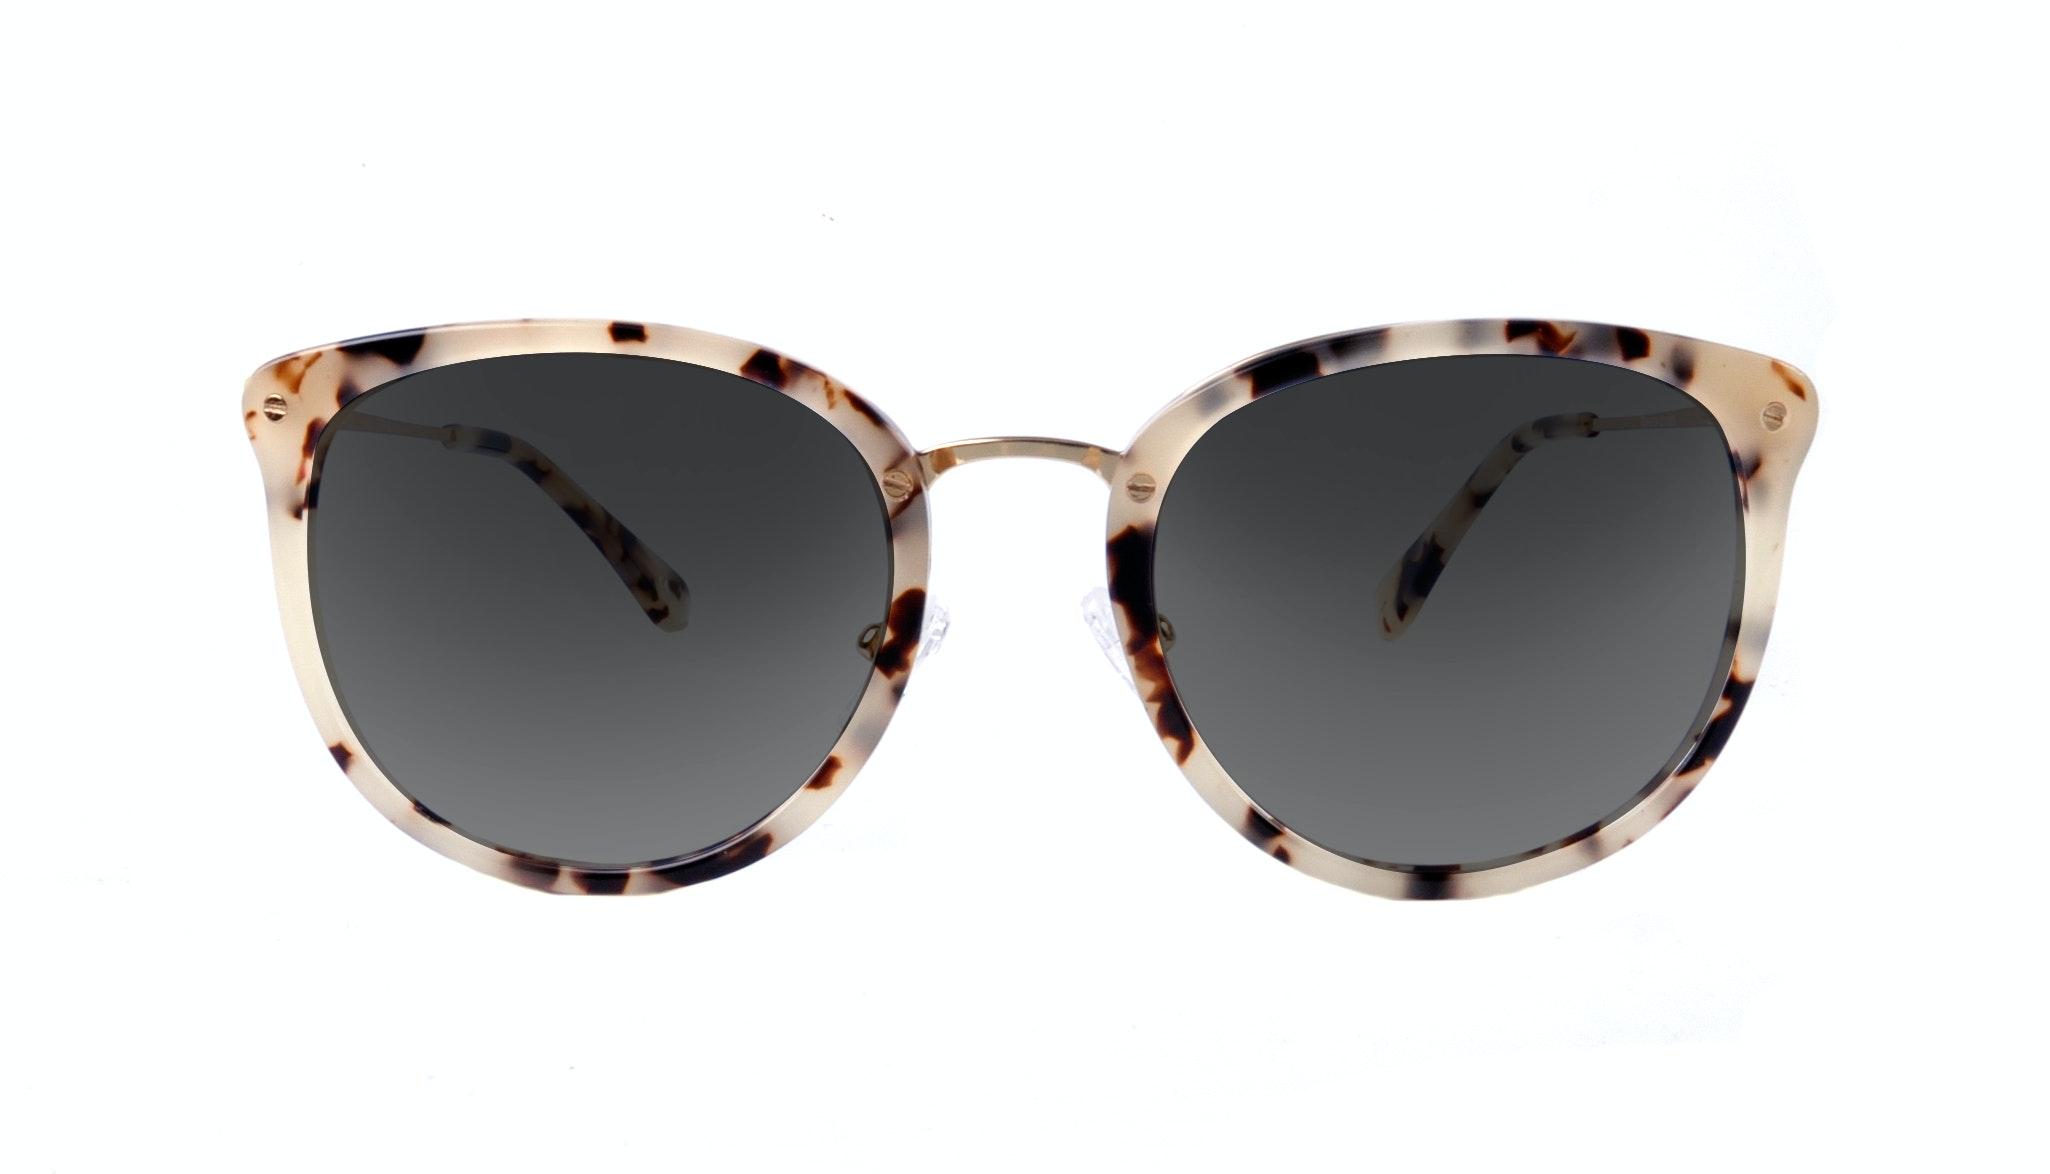 Affordable Fashion Glasses Round Sunglasses Women Amaze Granite